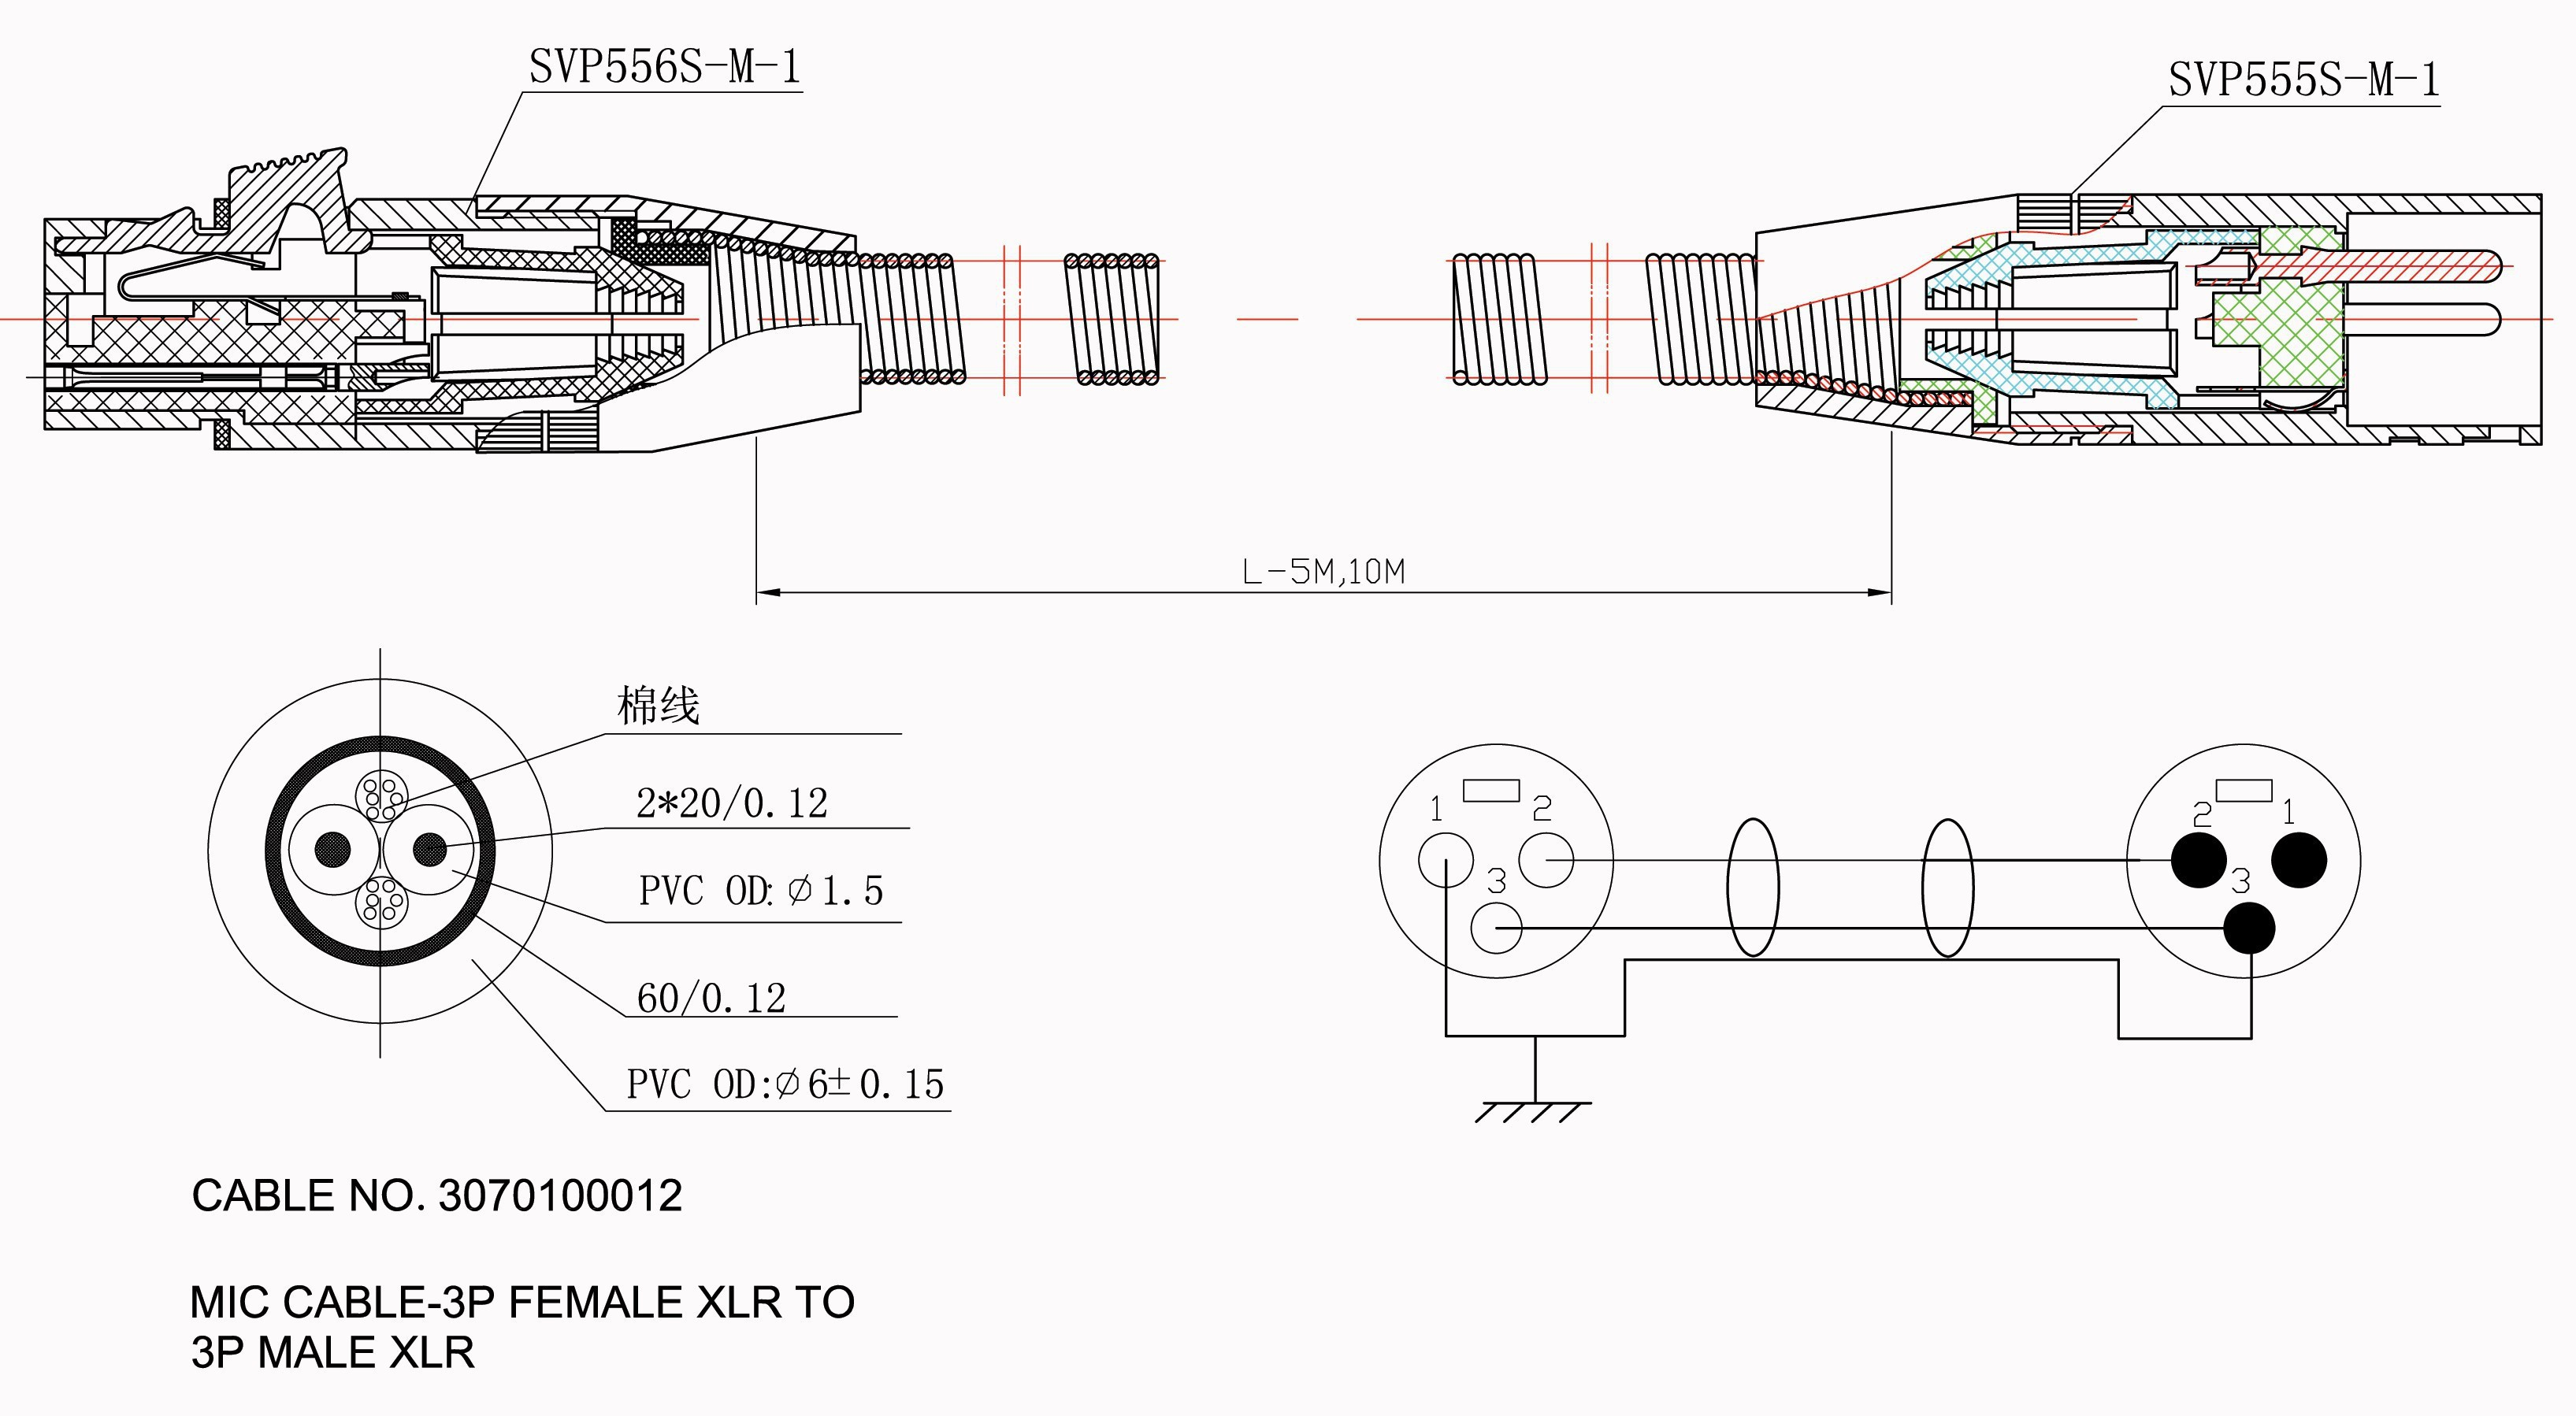 2001 Honda Civic Engine Diagram Honda Door Lock Wiring Diagram Worksheet and Wiring Diagram • Of 2001 Honda Civic Engine Diagram